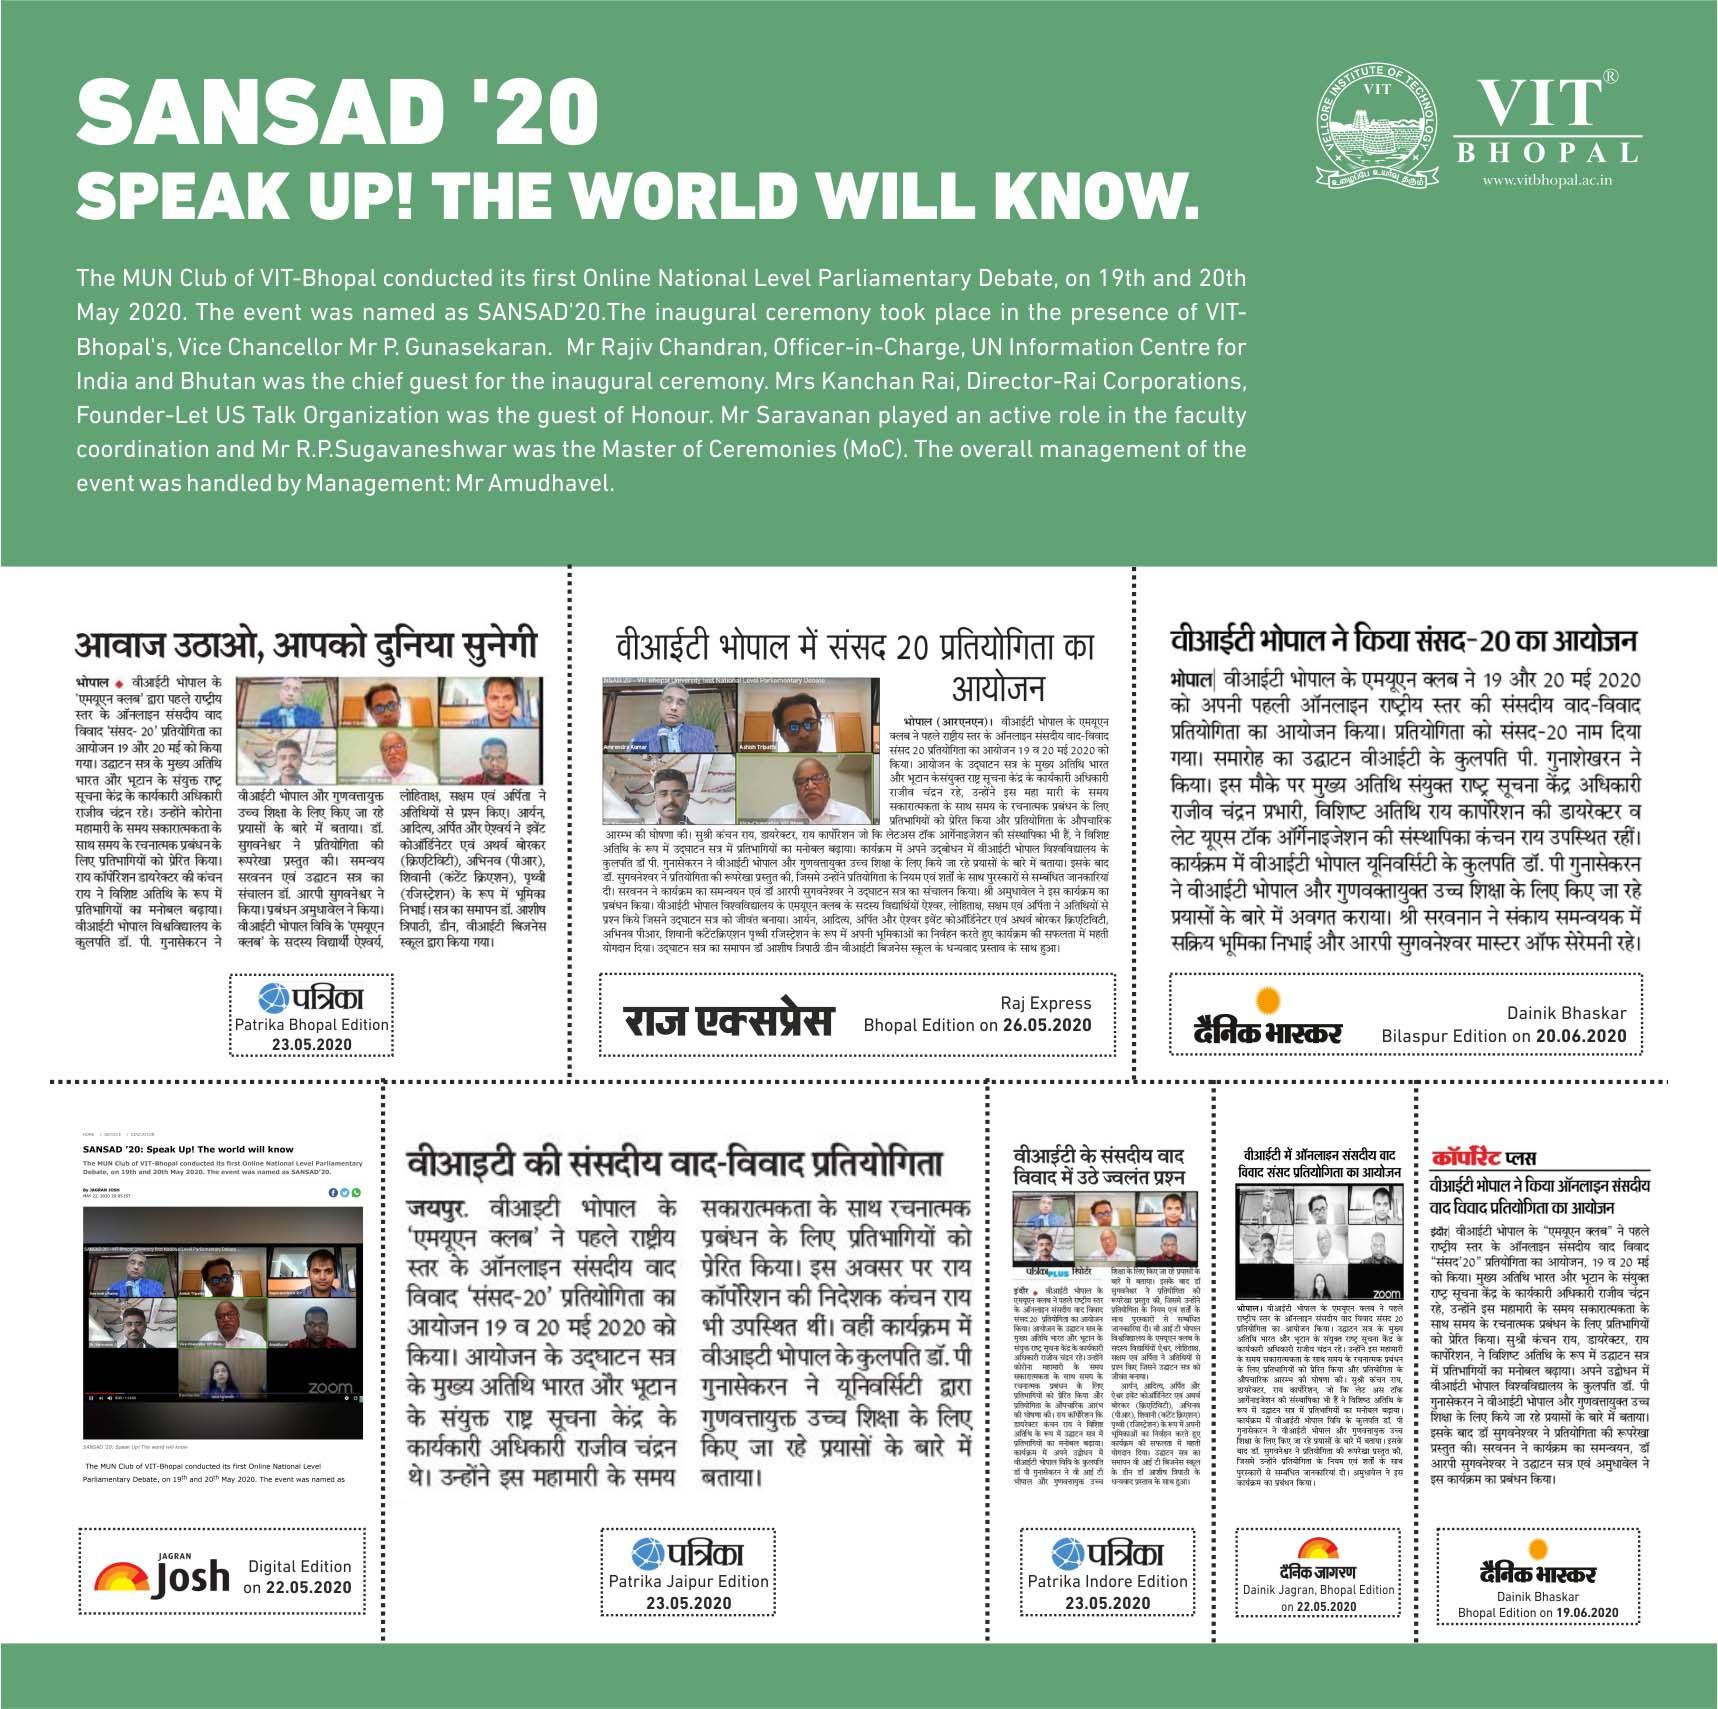 VIT Bhopal  - Best University in Central India -  sansad-2020-PR-collage-updated